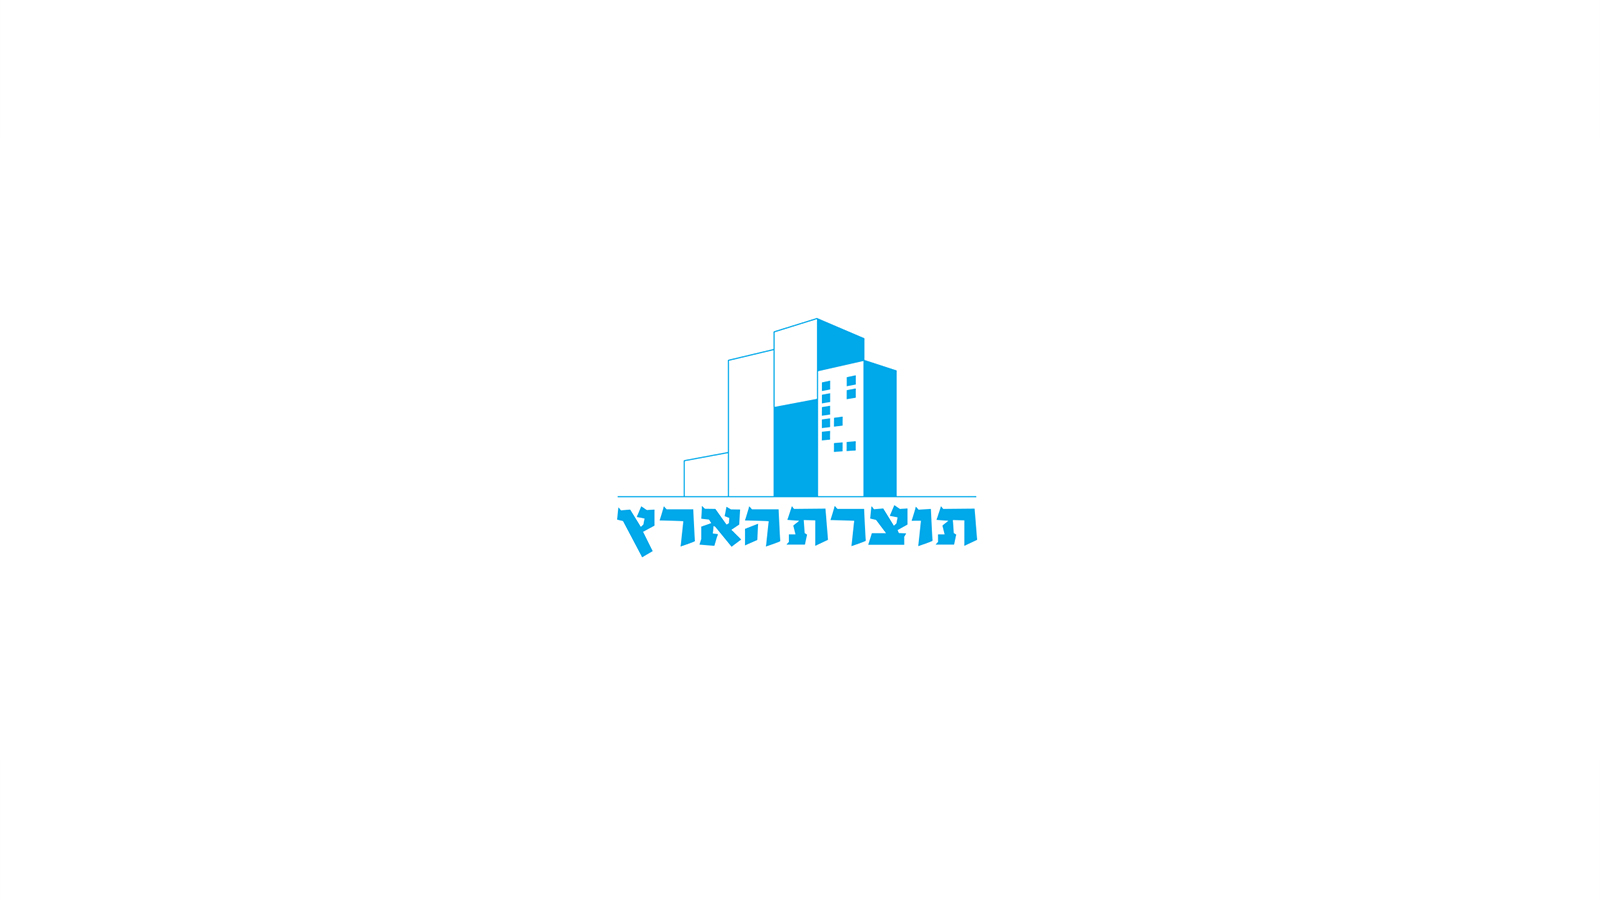 Logo design construction company עיצוב לוגו חברה קבלנית תוצרת הארץ